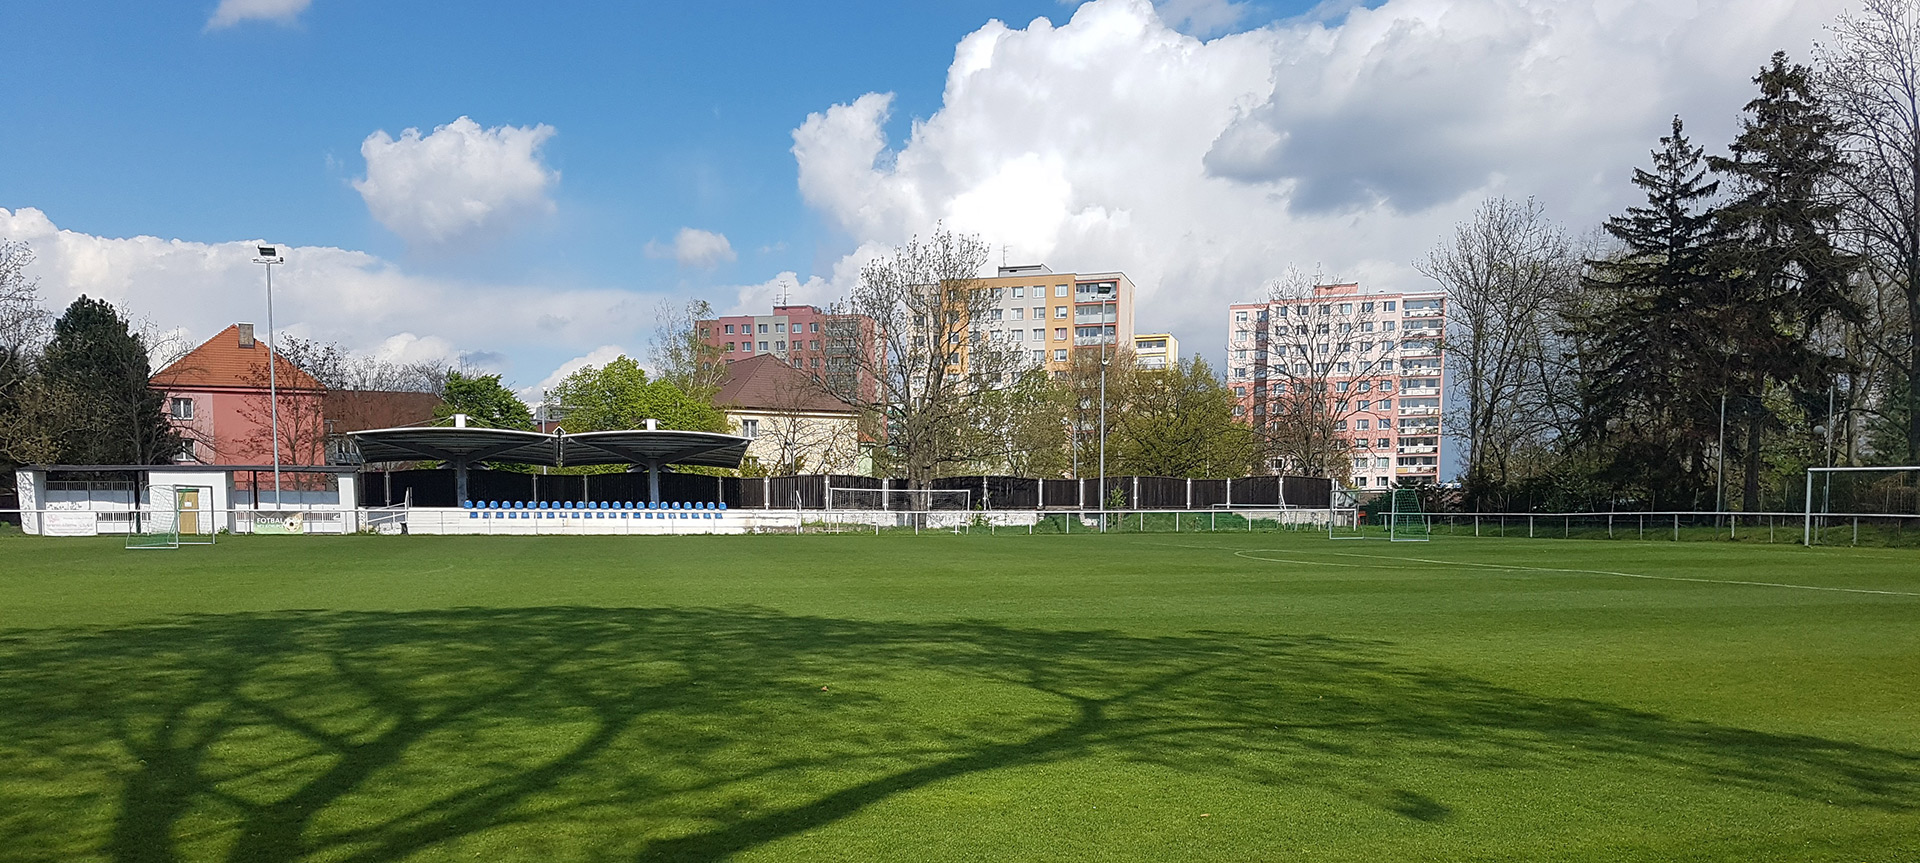 fotka_stadionu